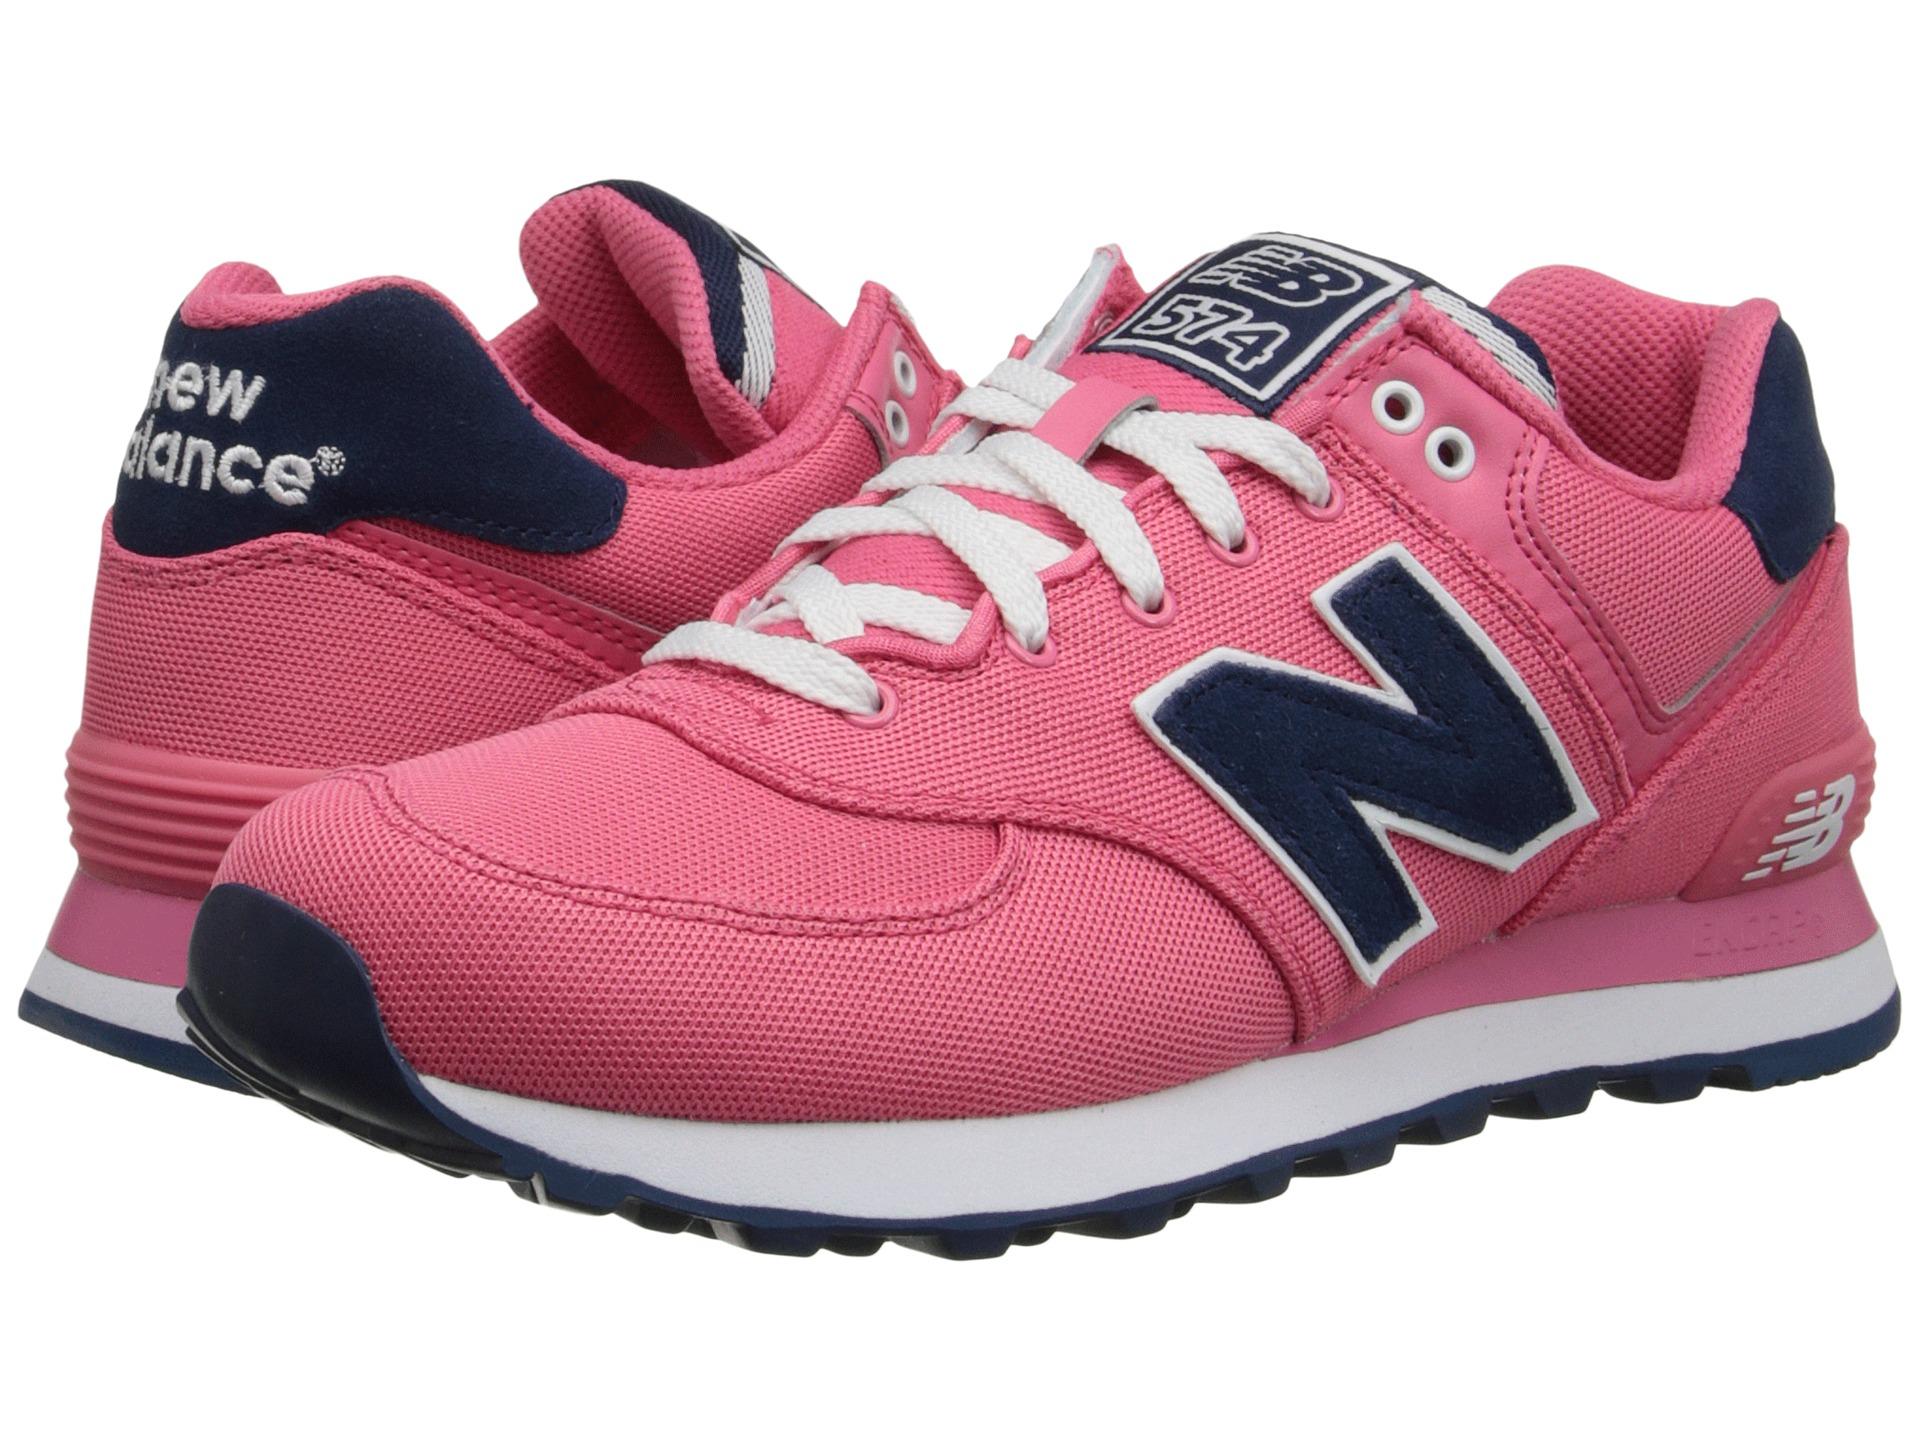 Womens Shoes New Balance Classics WL574 Blush